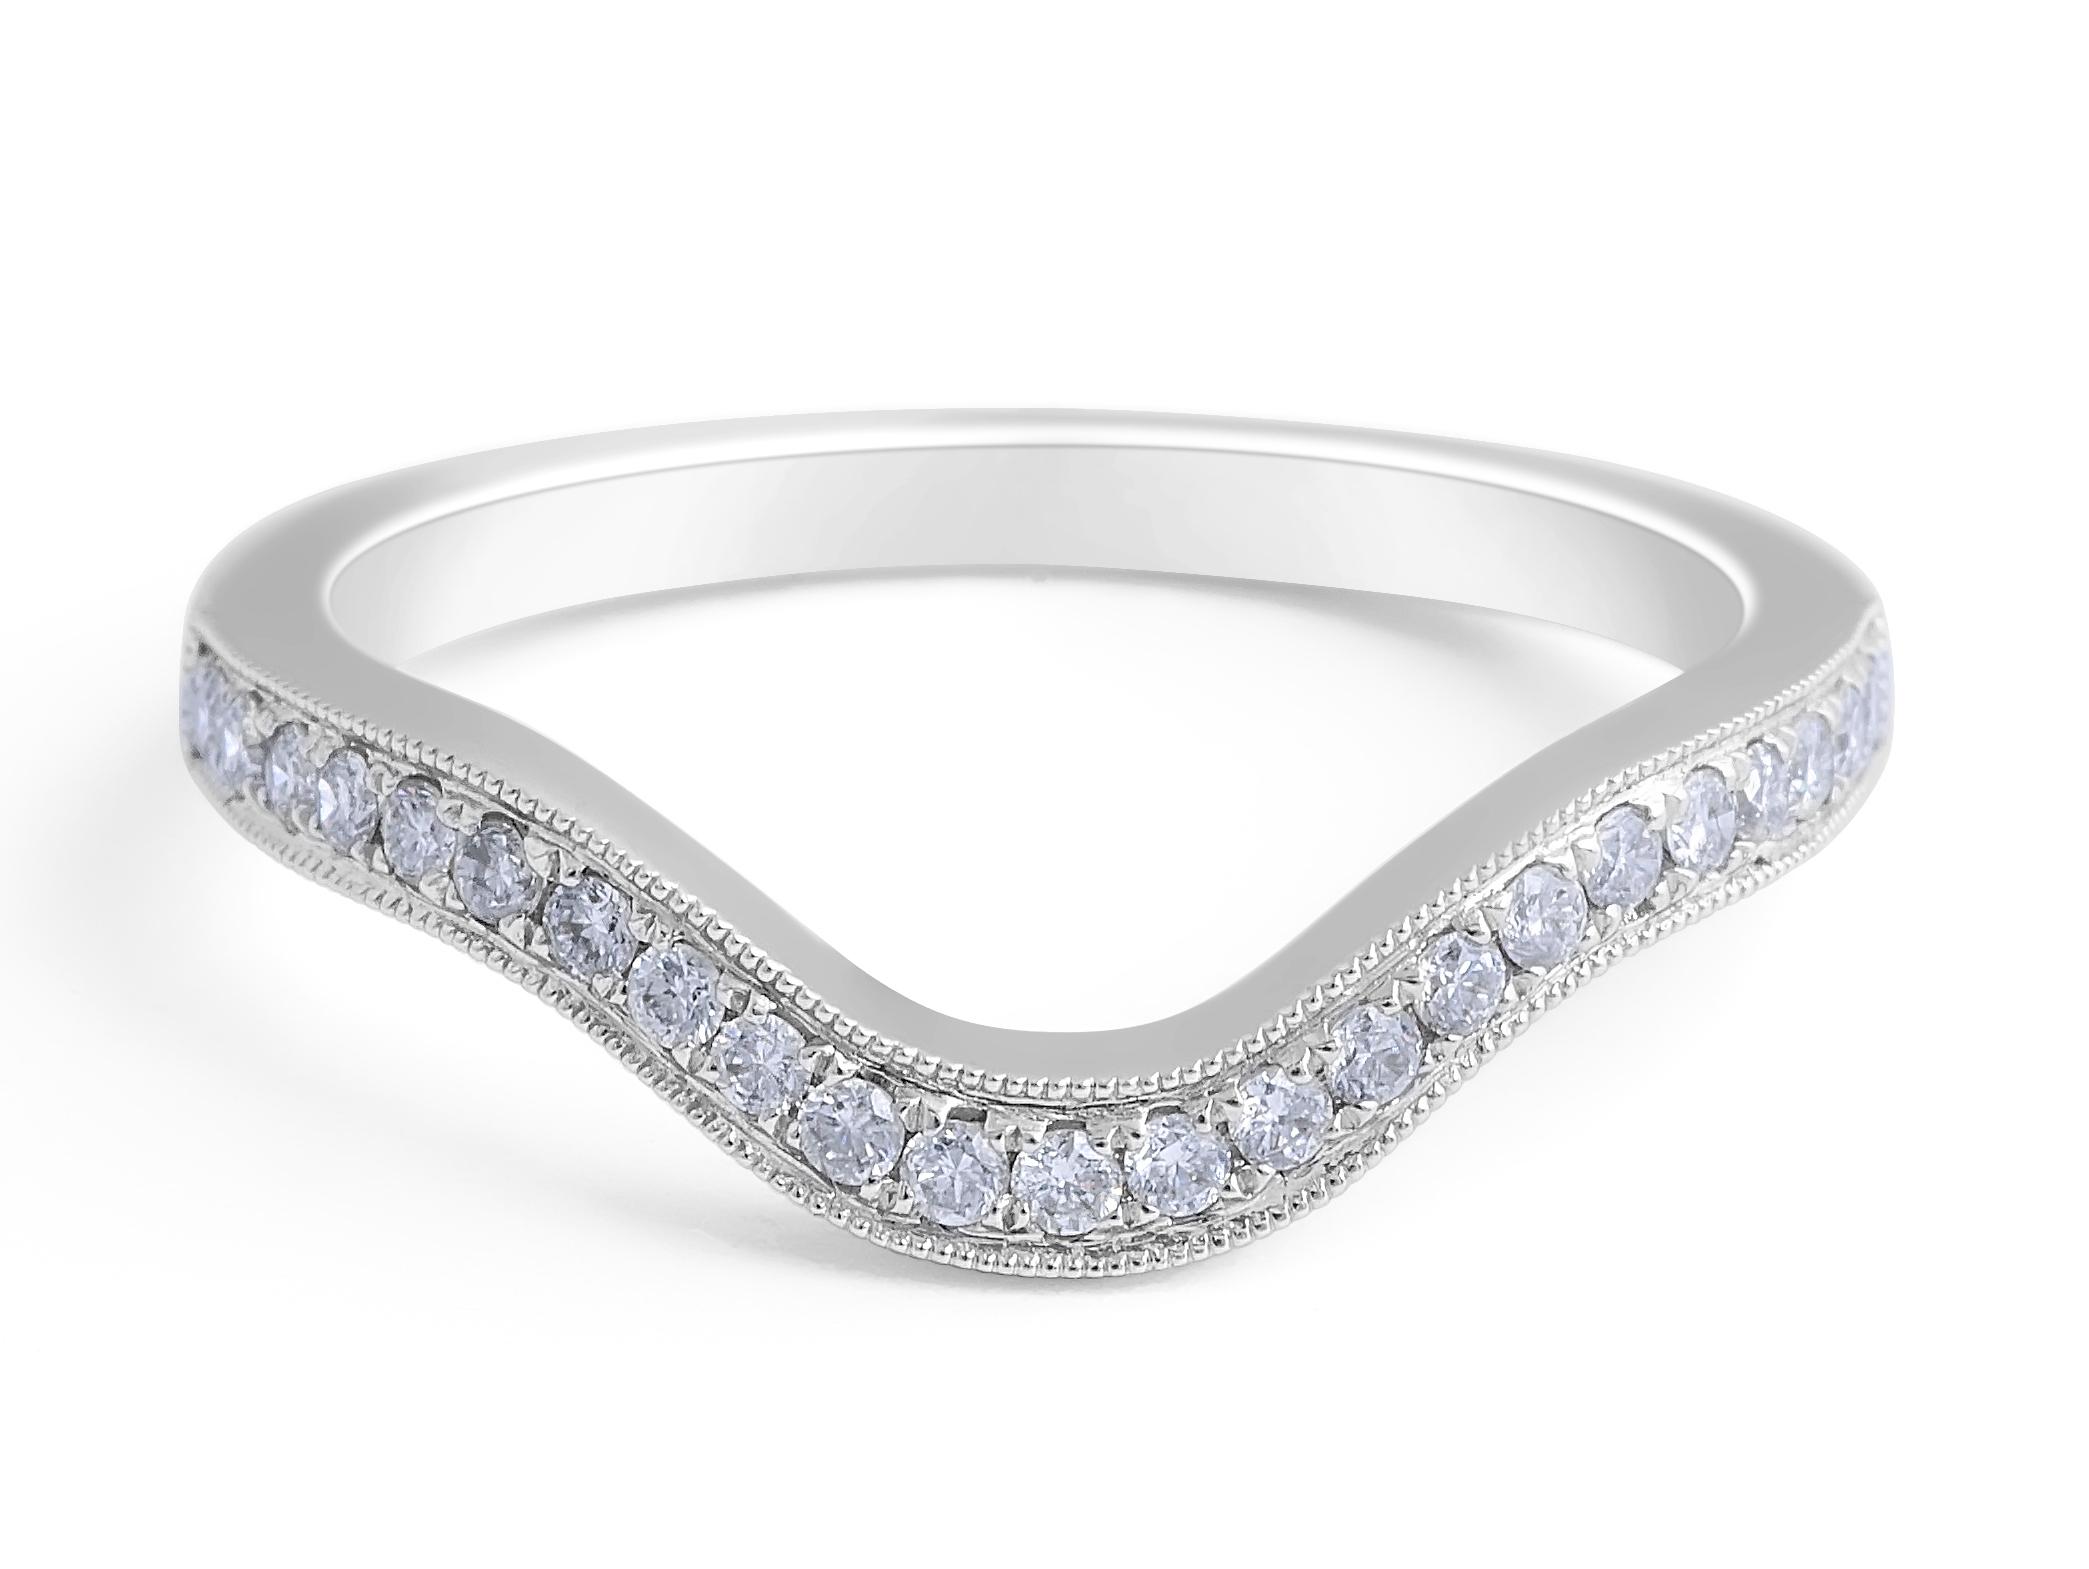 18 Karat White Gold Vintage Style Concave Diamond Wedding Band